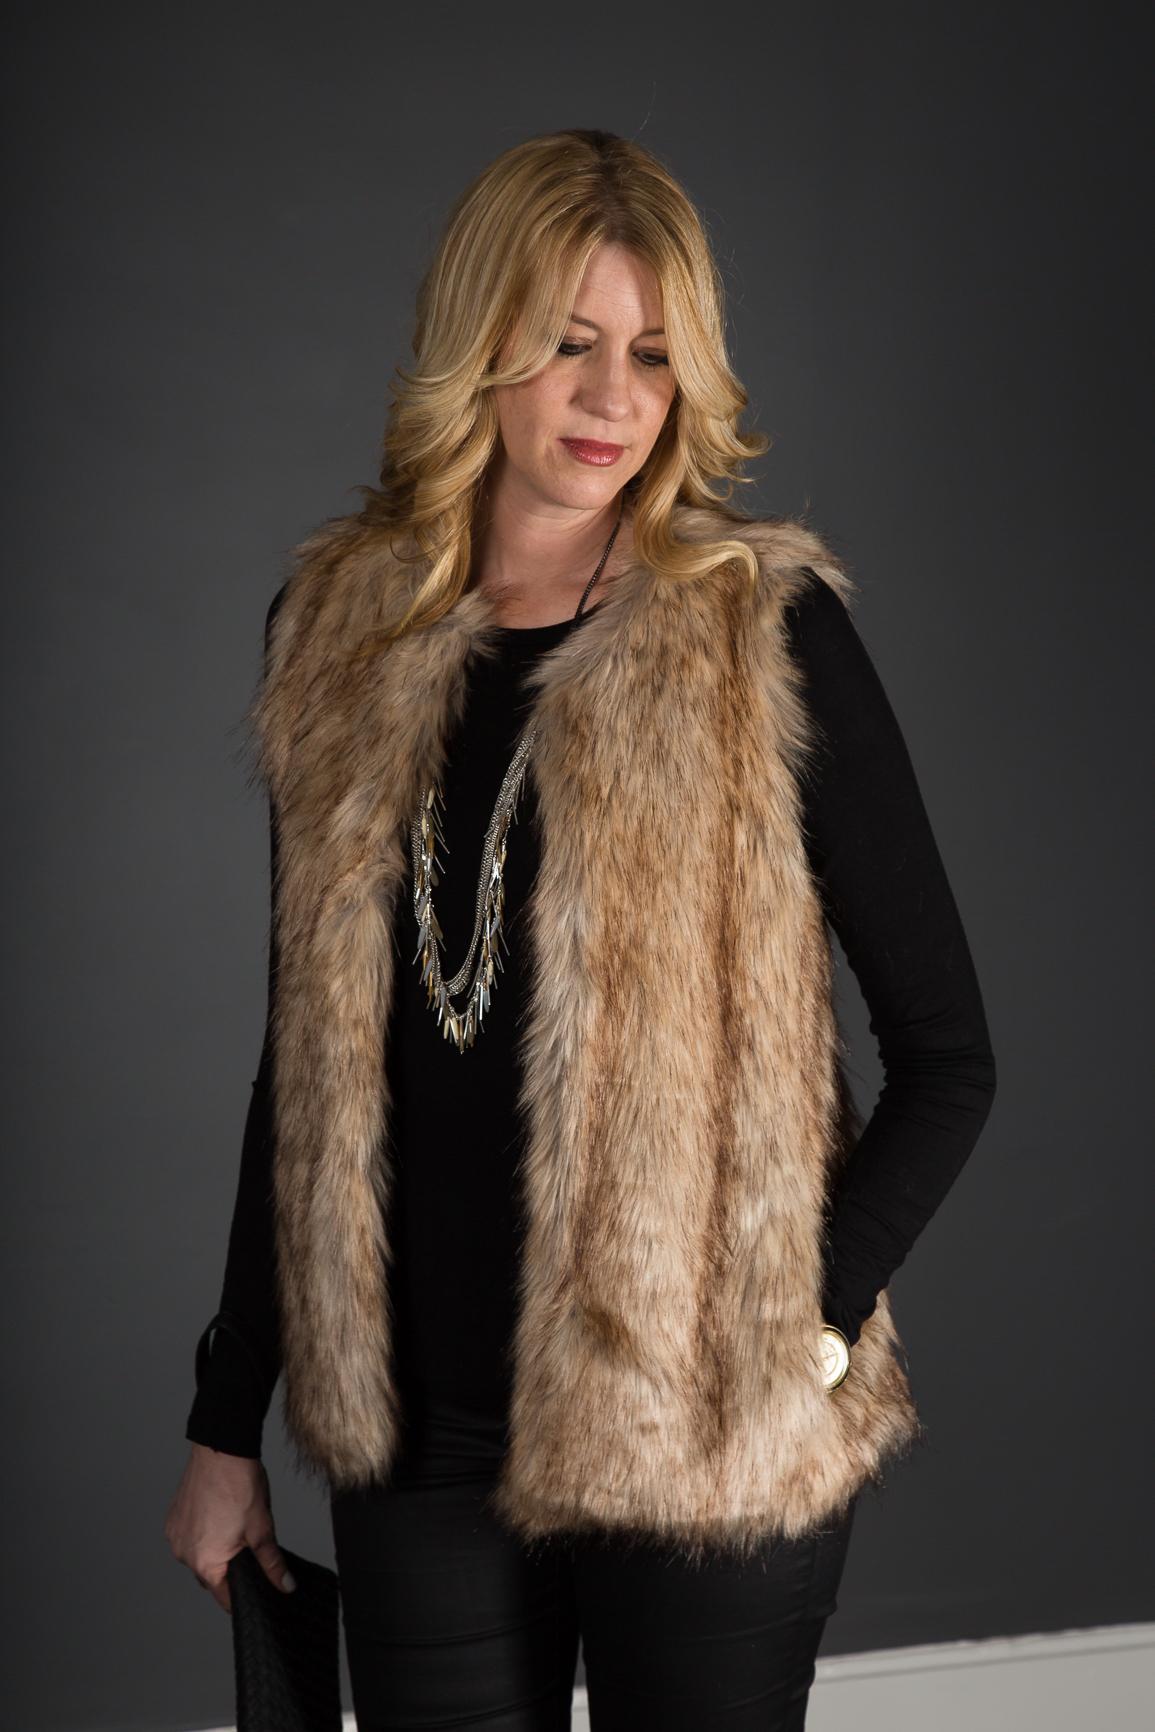 fur vest & coated denim outfit